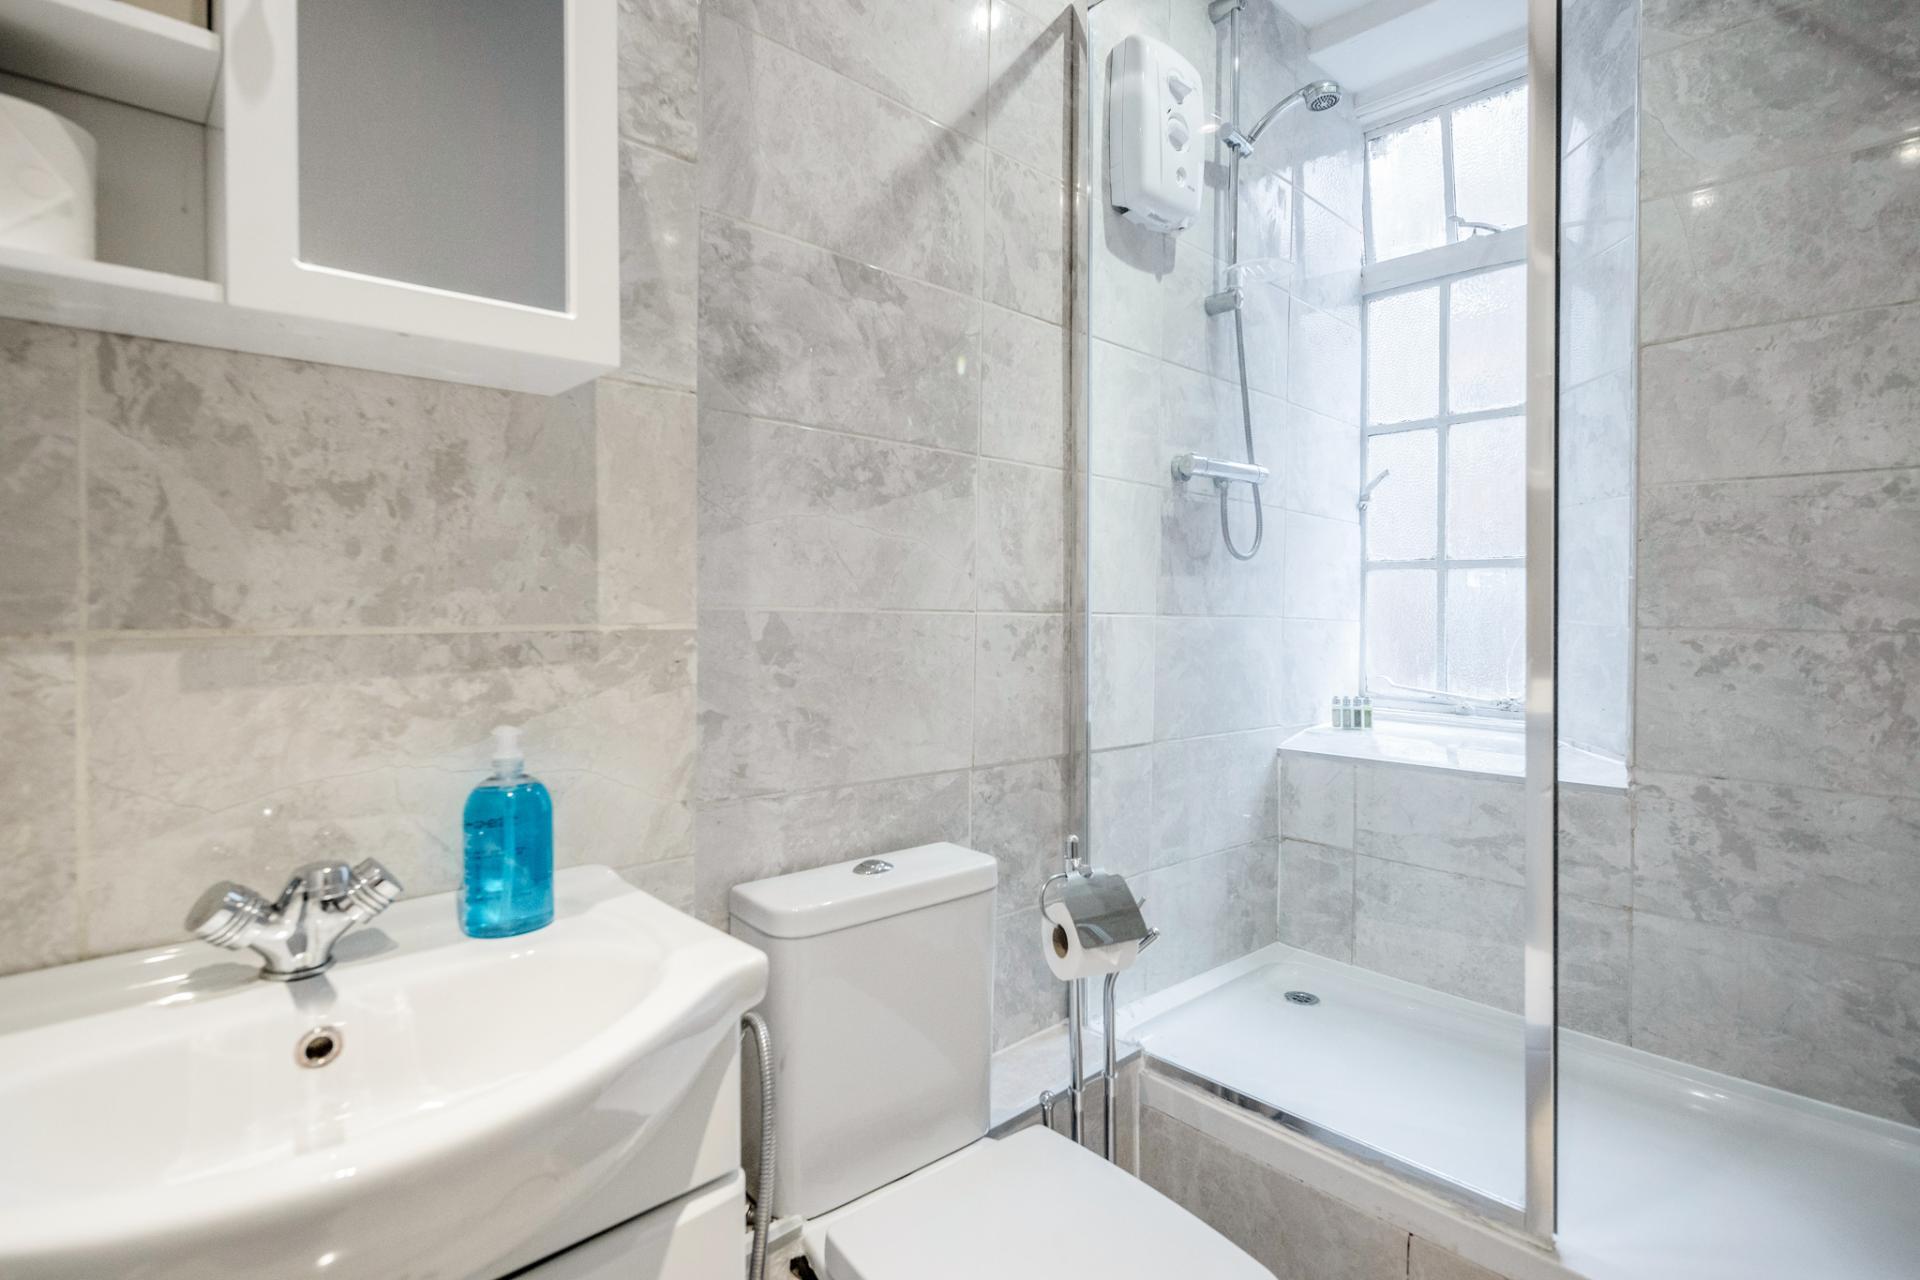 Bathroom at Marylebone Luxury Apartments, Marylebone, London - Citybase Apartments